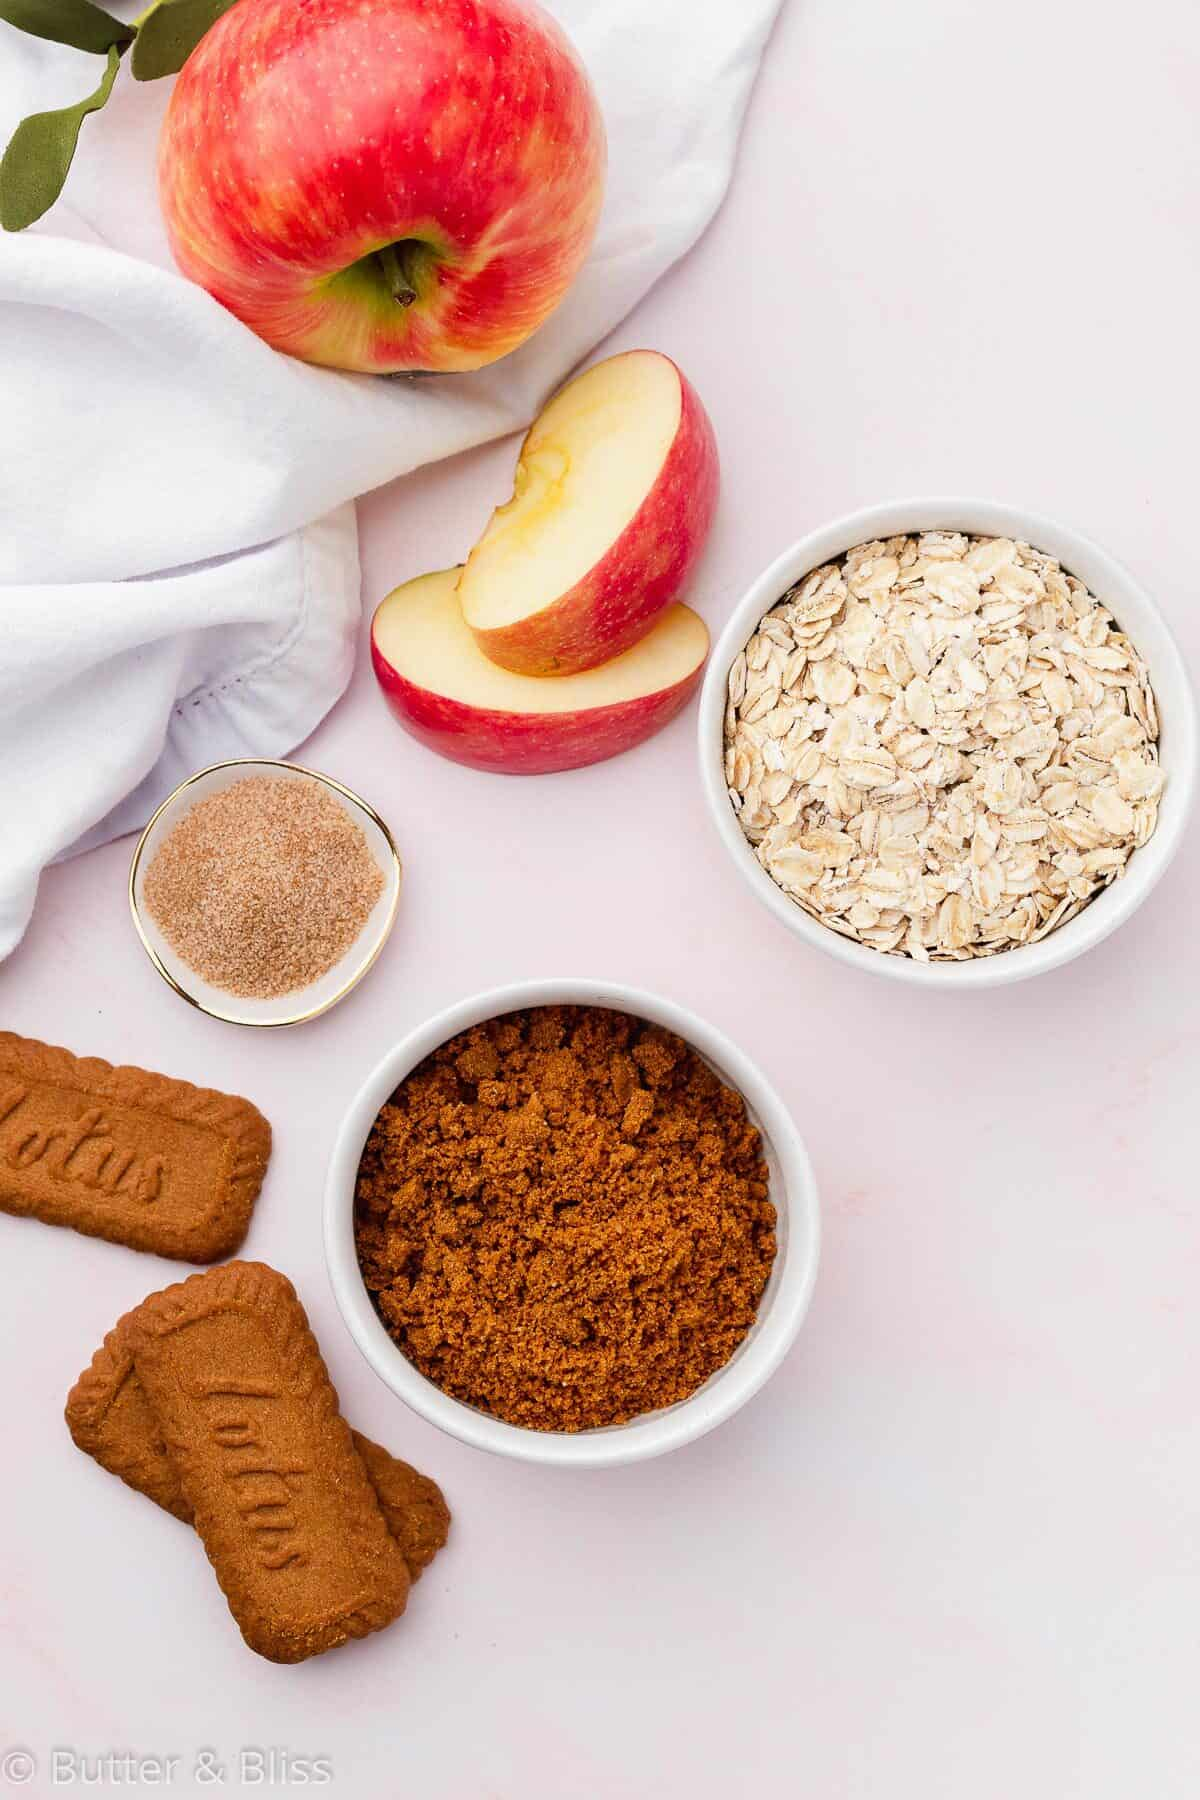 Ingredients for fall apple crisp